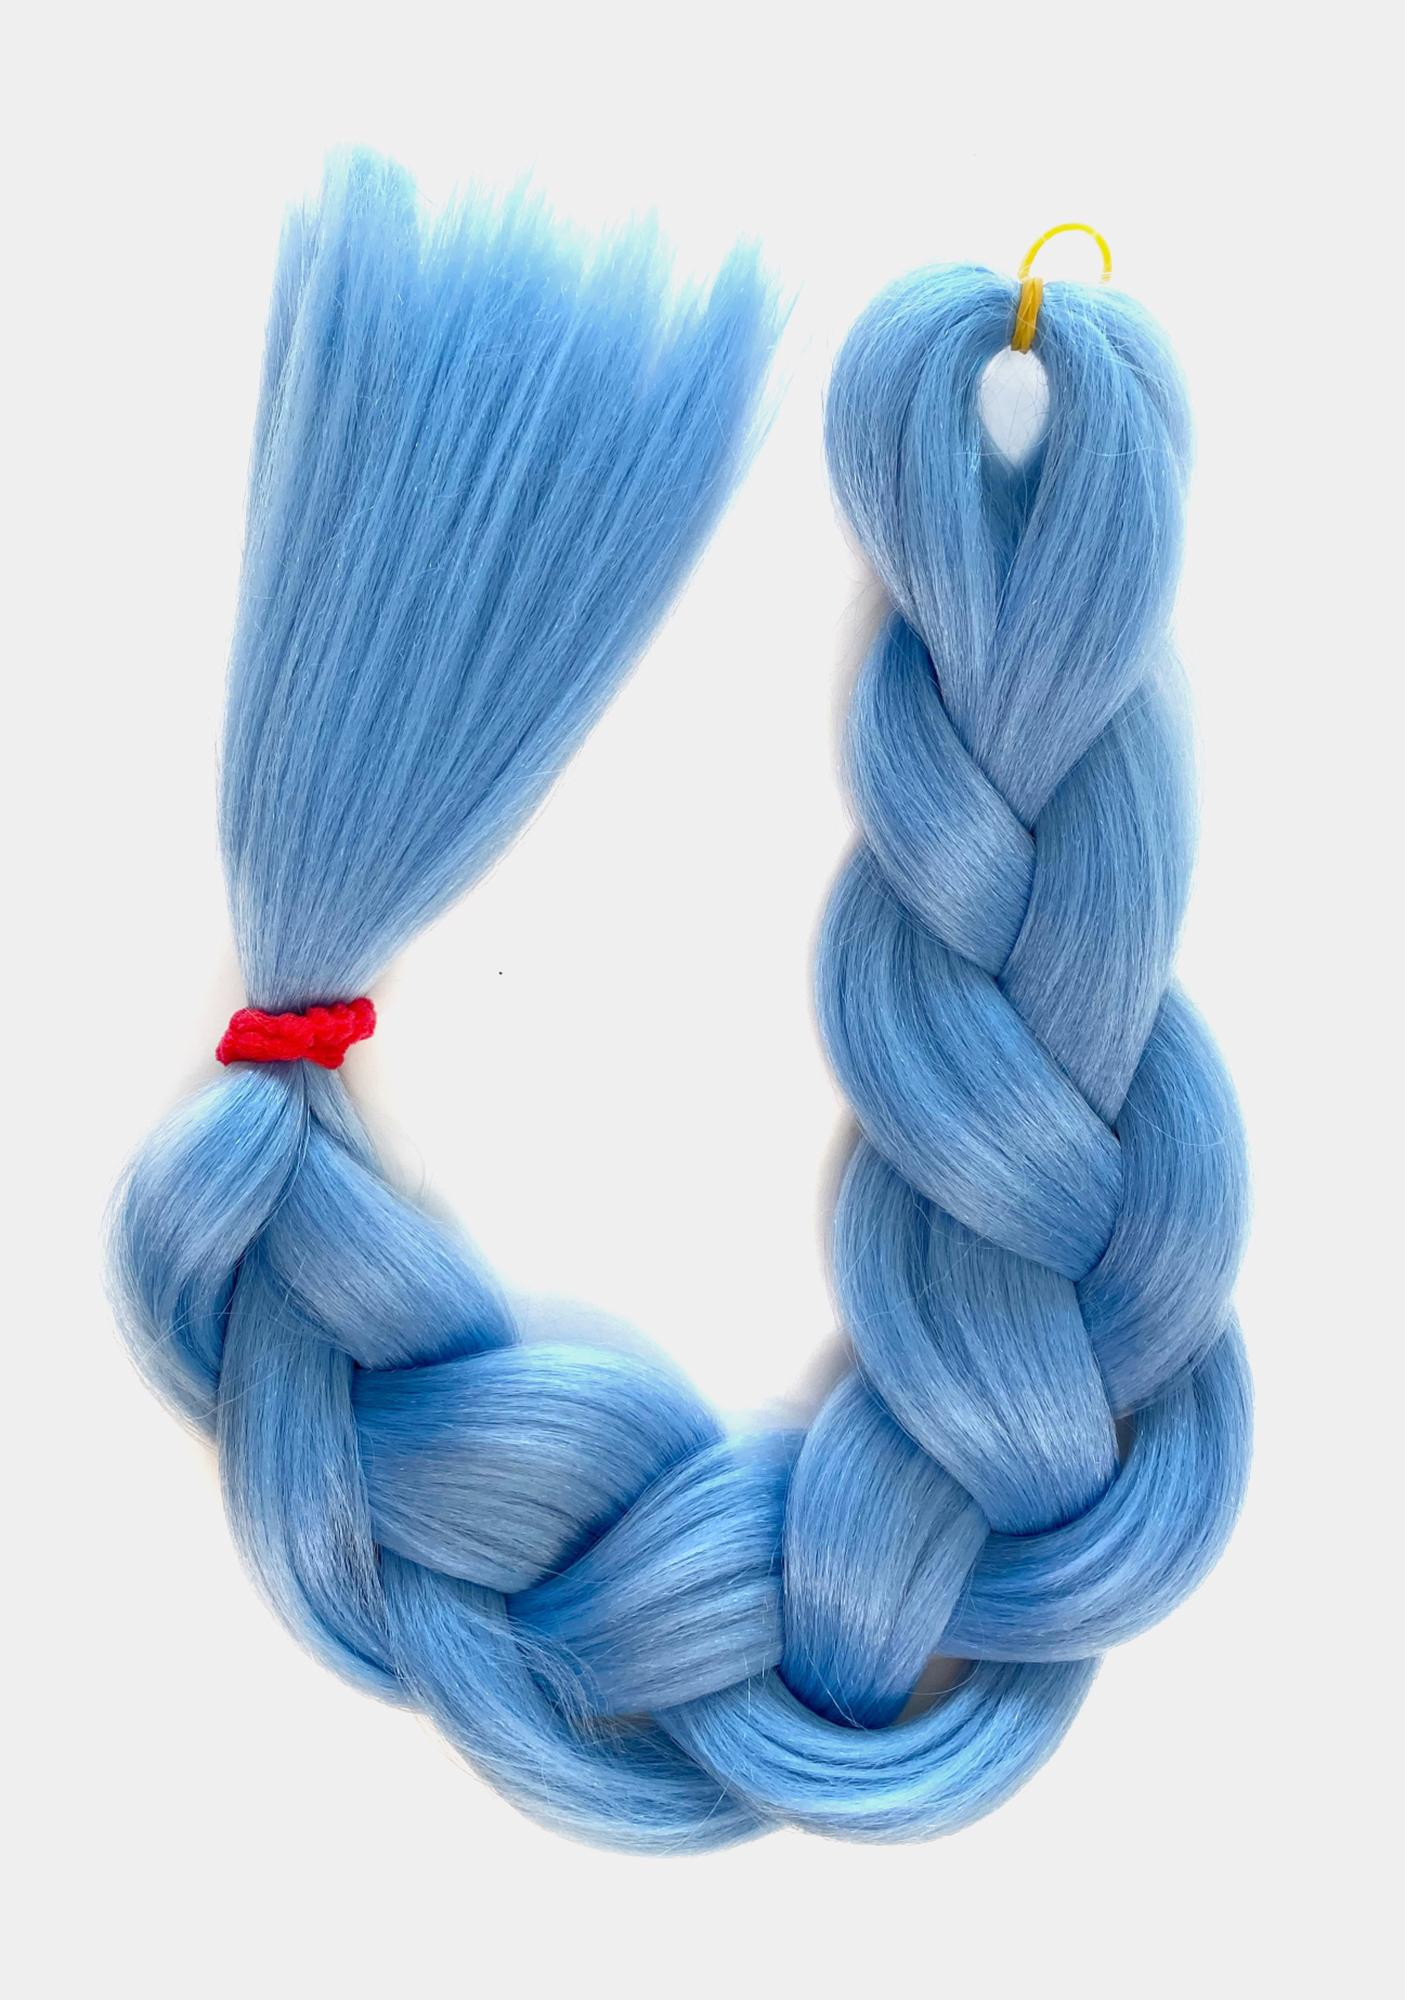 Lunautics Princess Hair Extensions